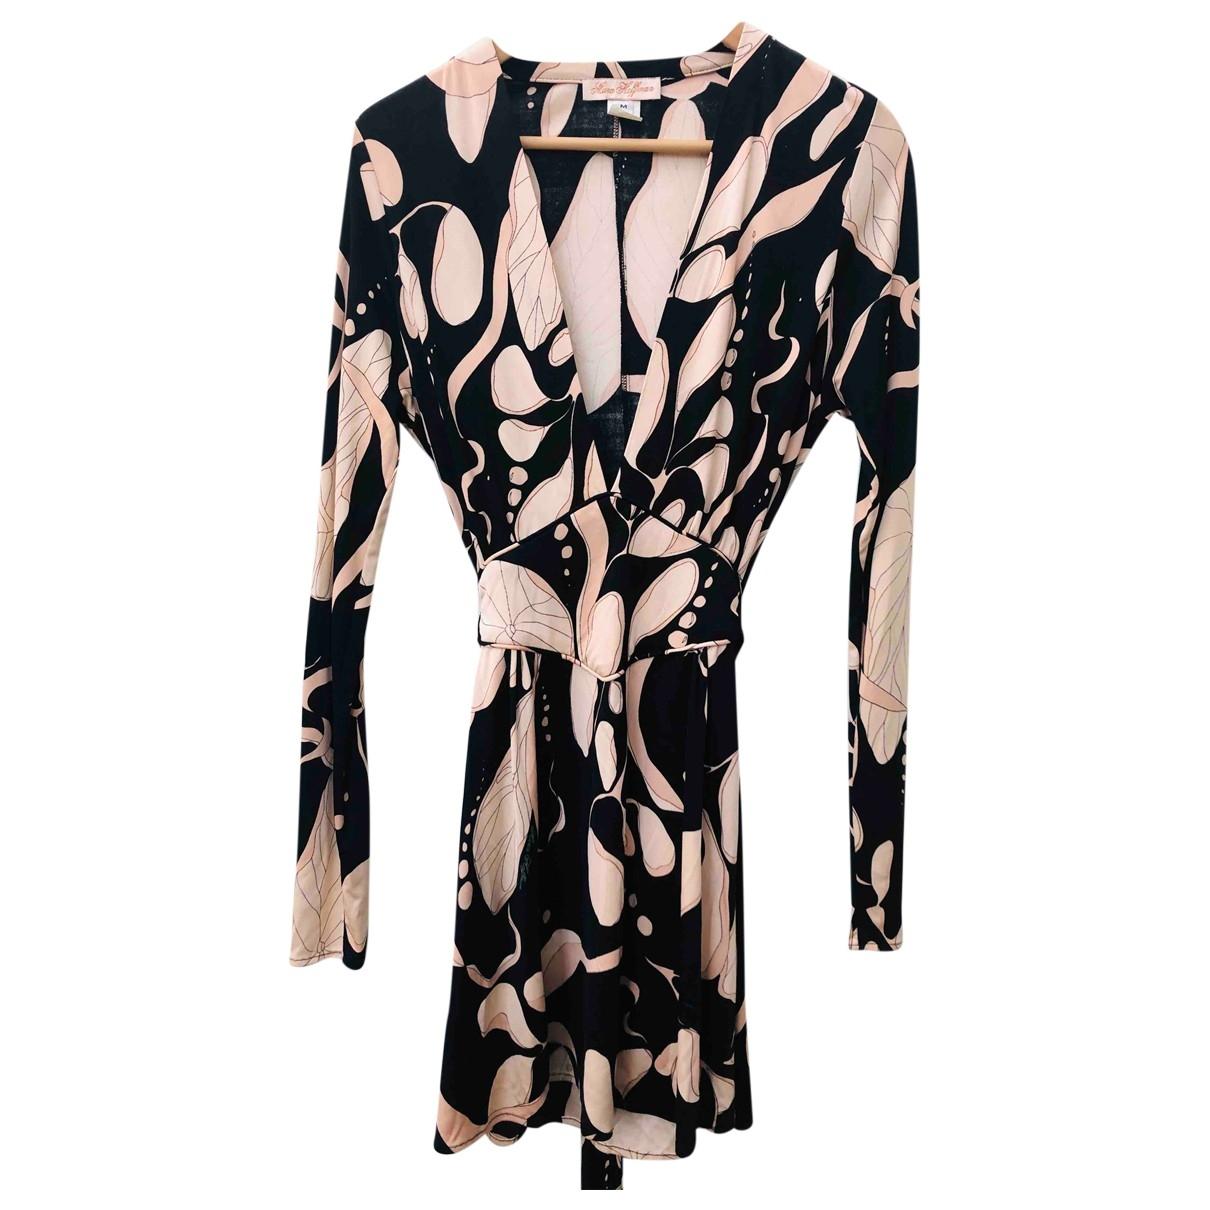 Mara Hoffman \N Multicolour Silk dress for Women M International